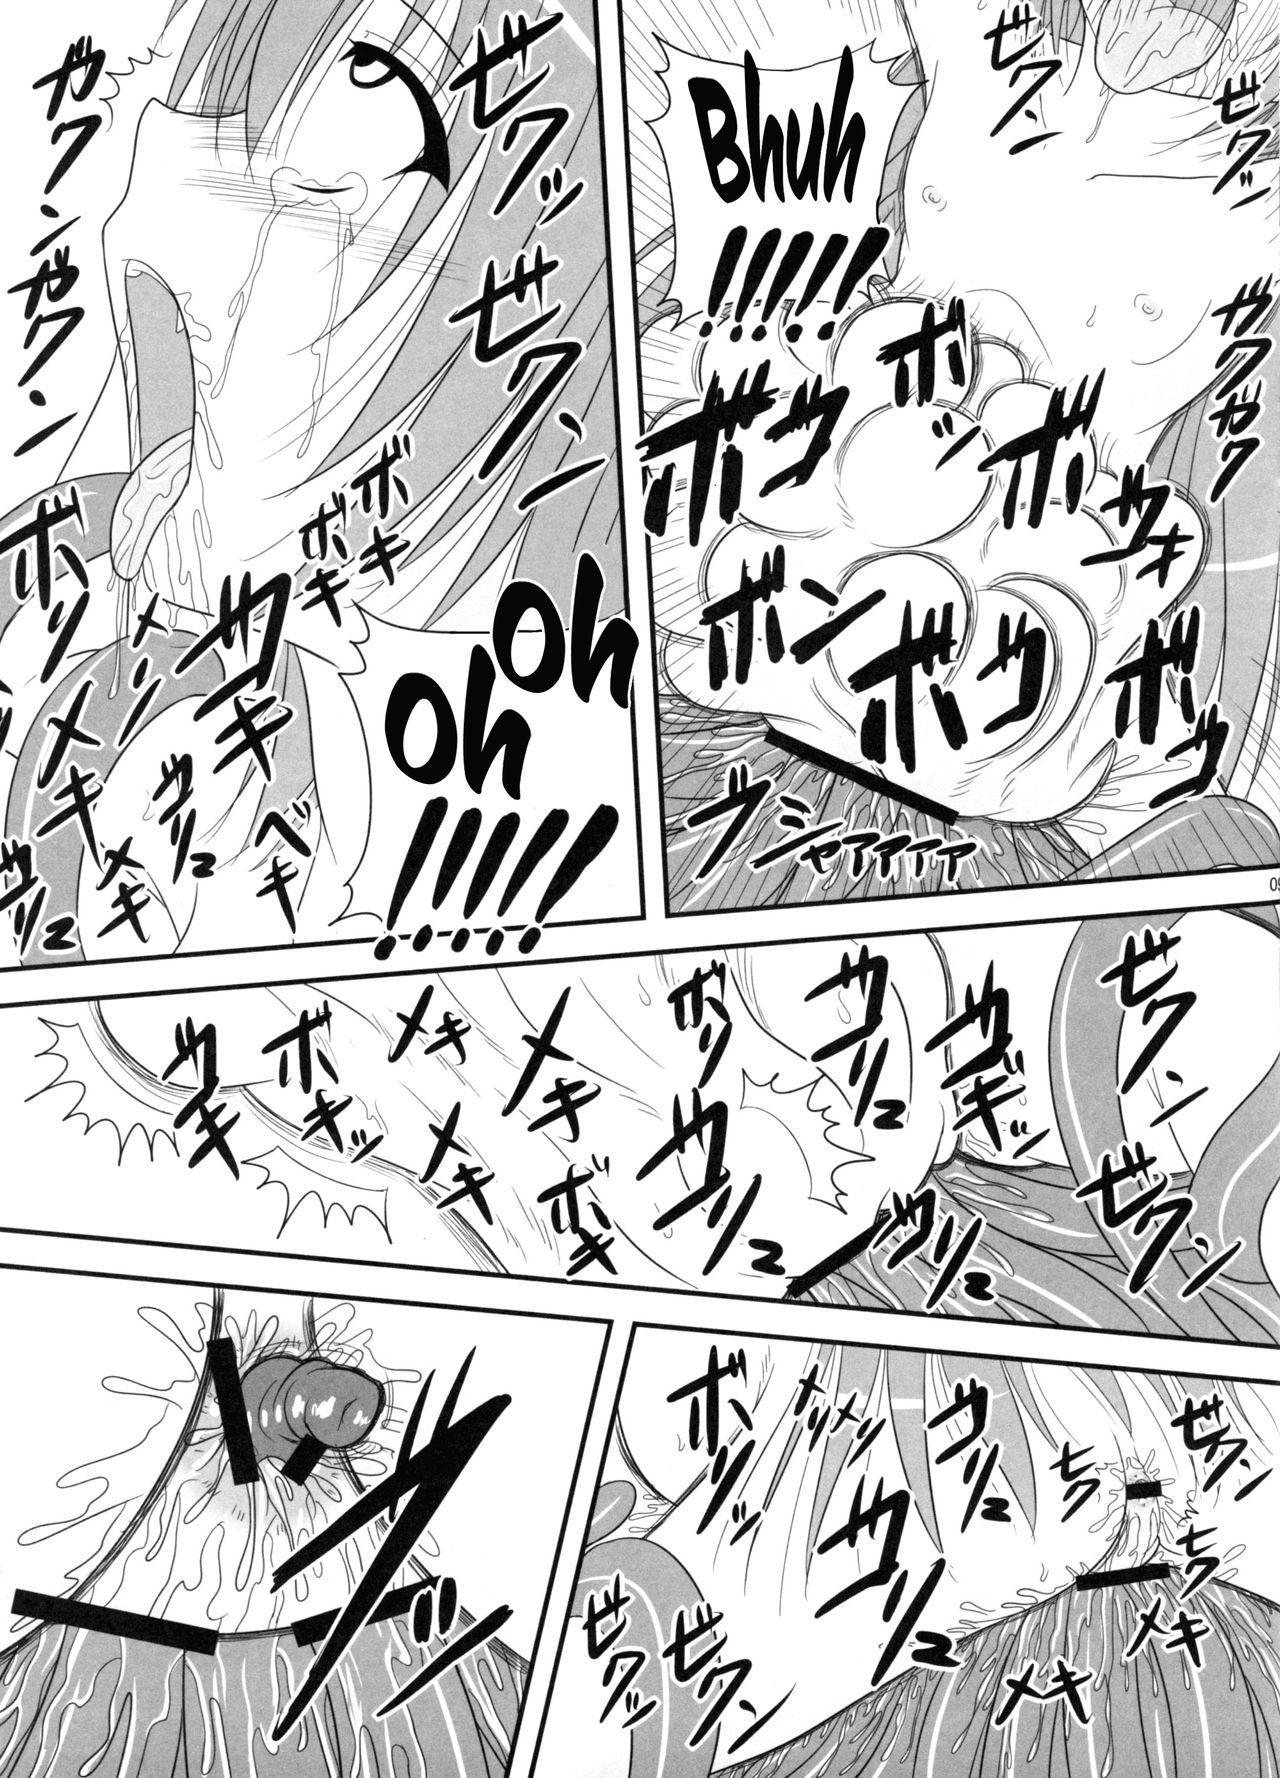 Itsuka Zenshin Funsha no Kuso Usagi | A Shitty Rabbit Gets Repeated Full Body Injections 7